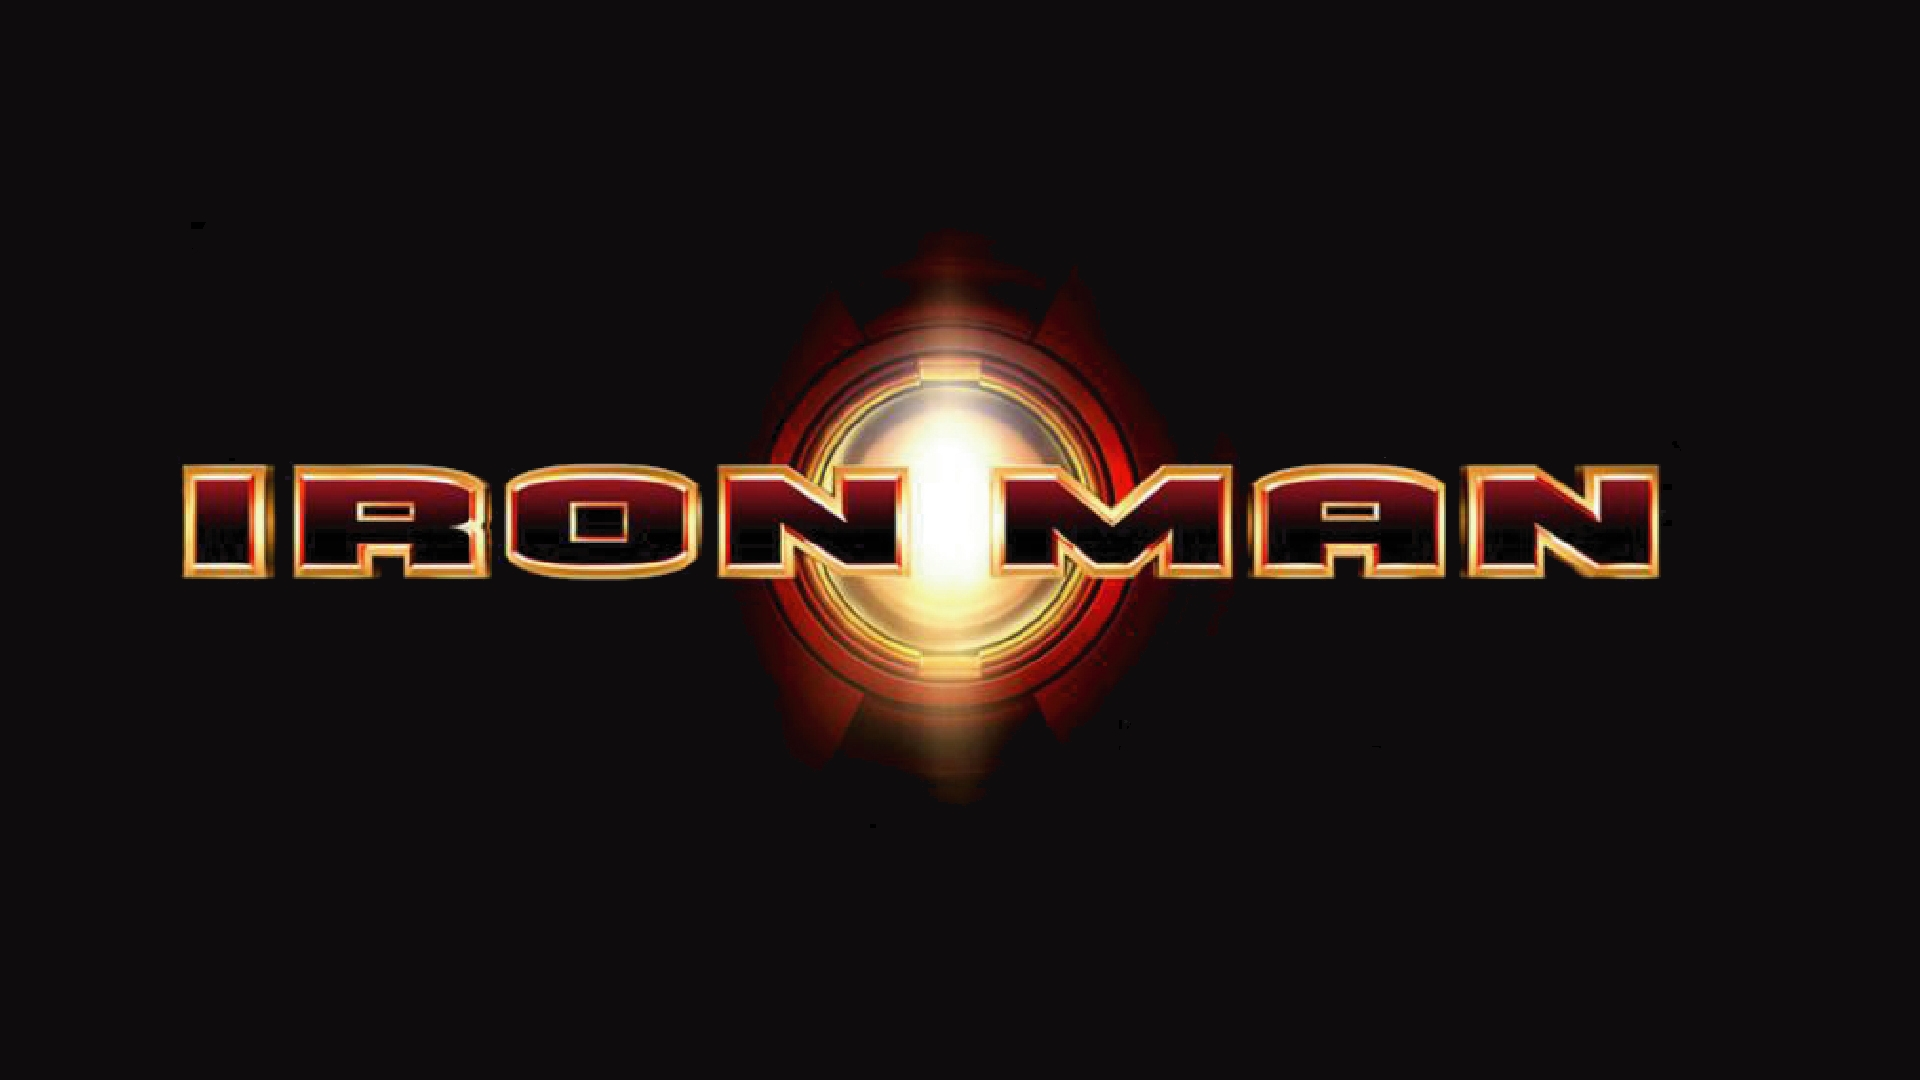 Bullet For My Valentine Wallpaper Hd Iron Man Desktop Background Download Pixelstalk Net